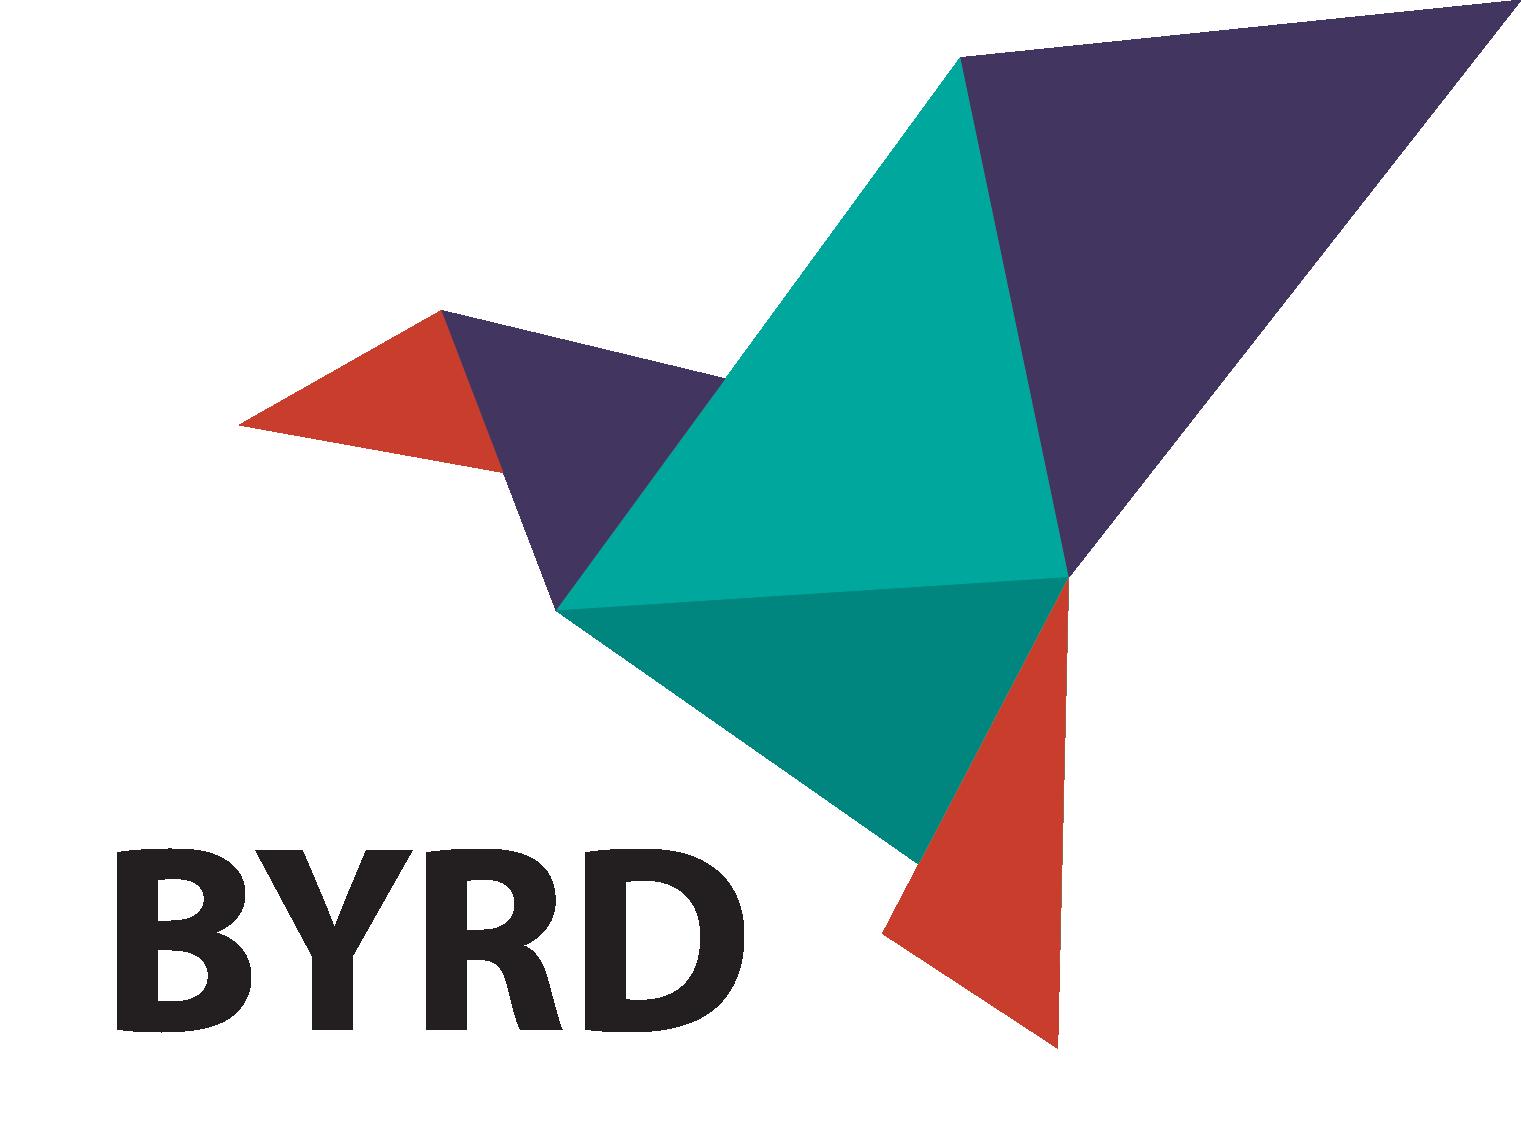 Byrd's Logo